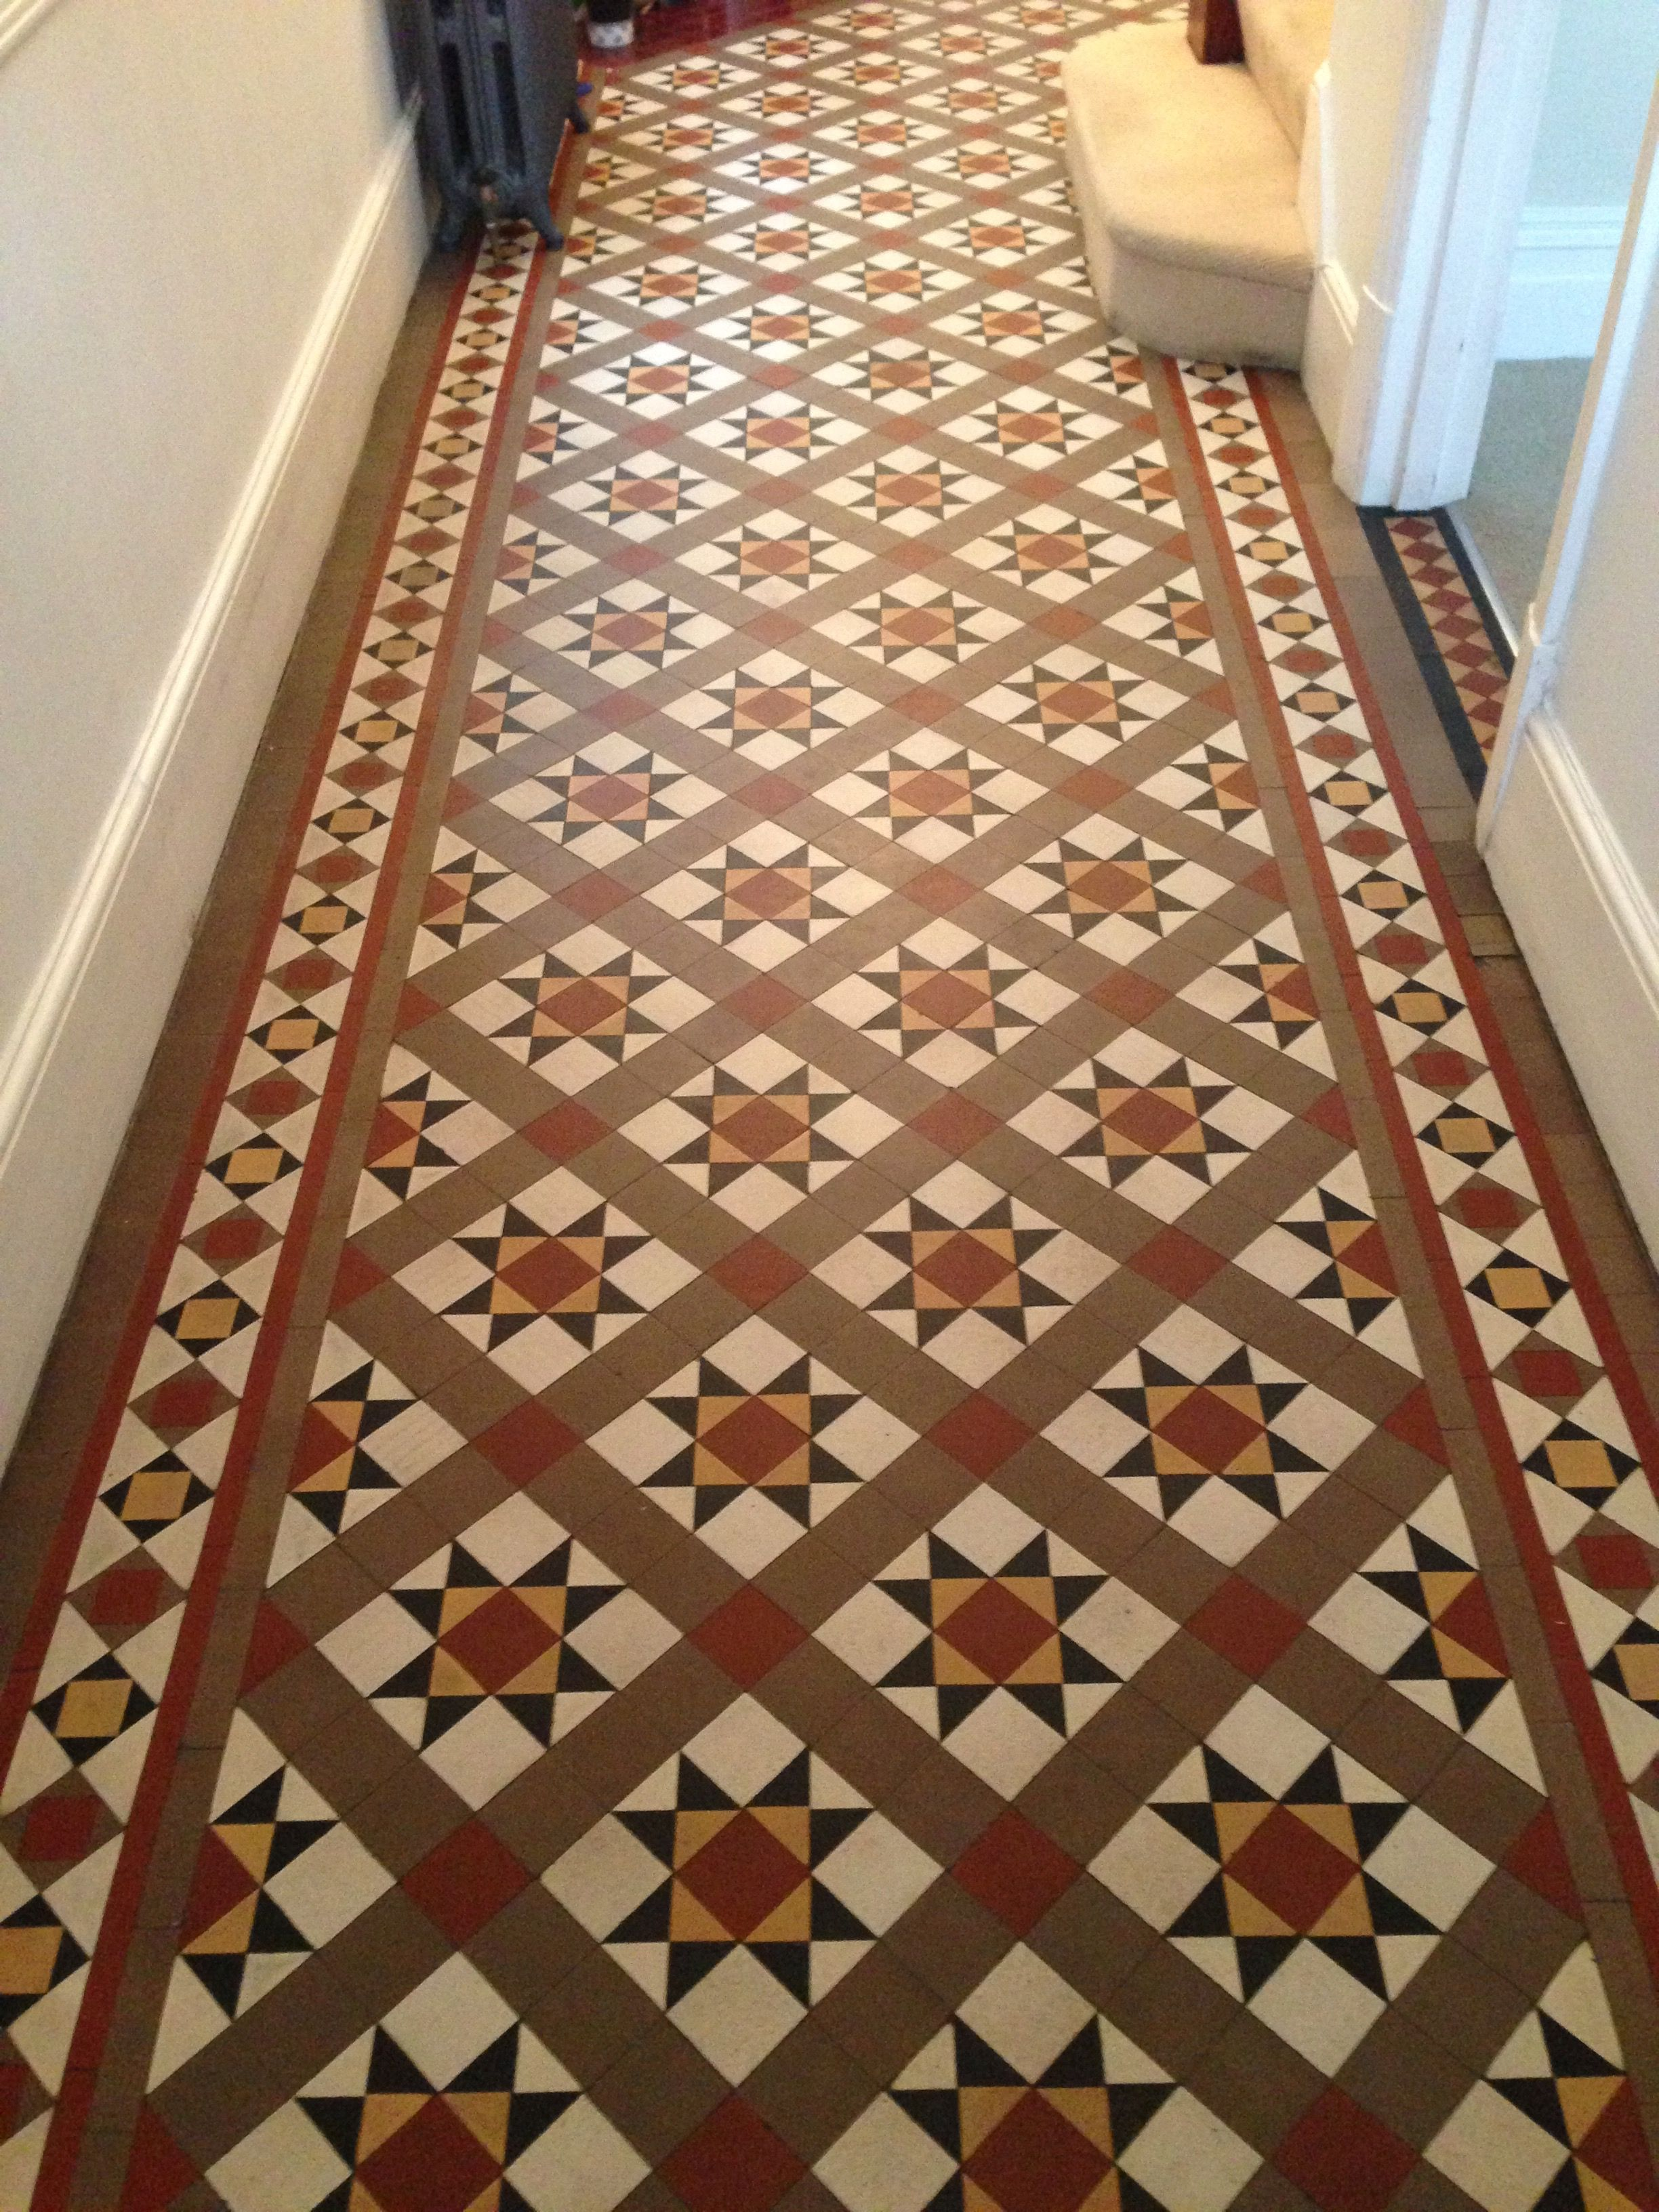 Restored Victorian Tiled Floor In London The Work Was Undertake